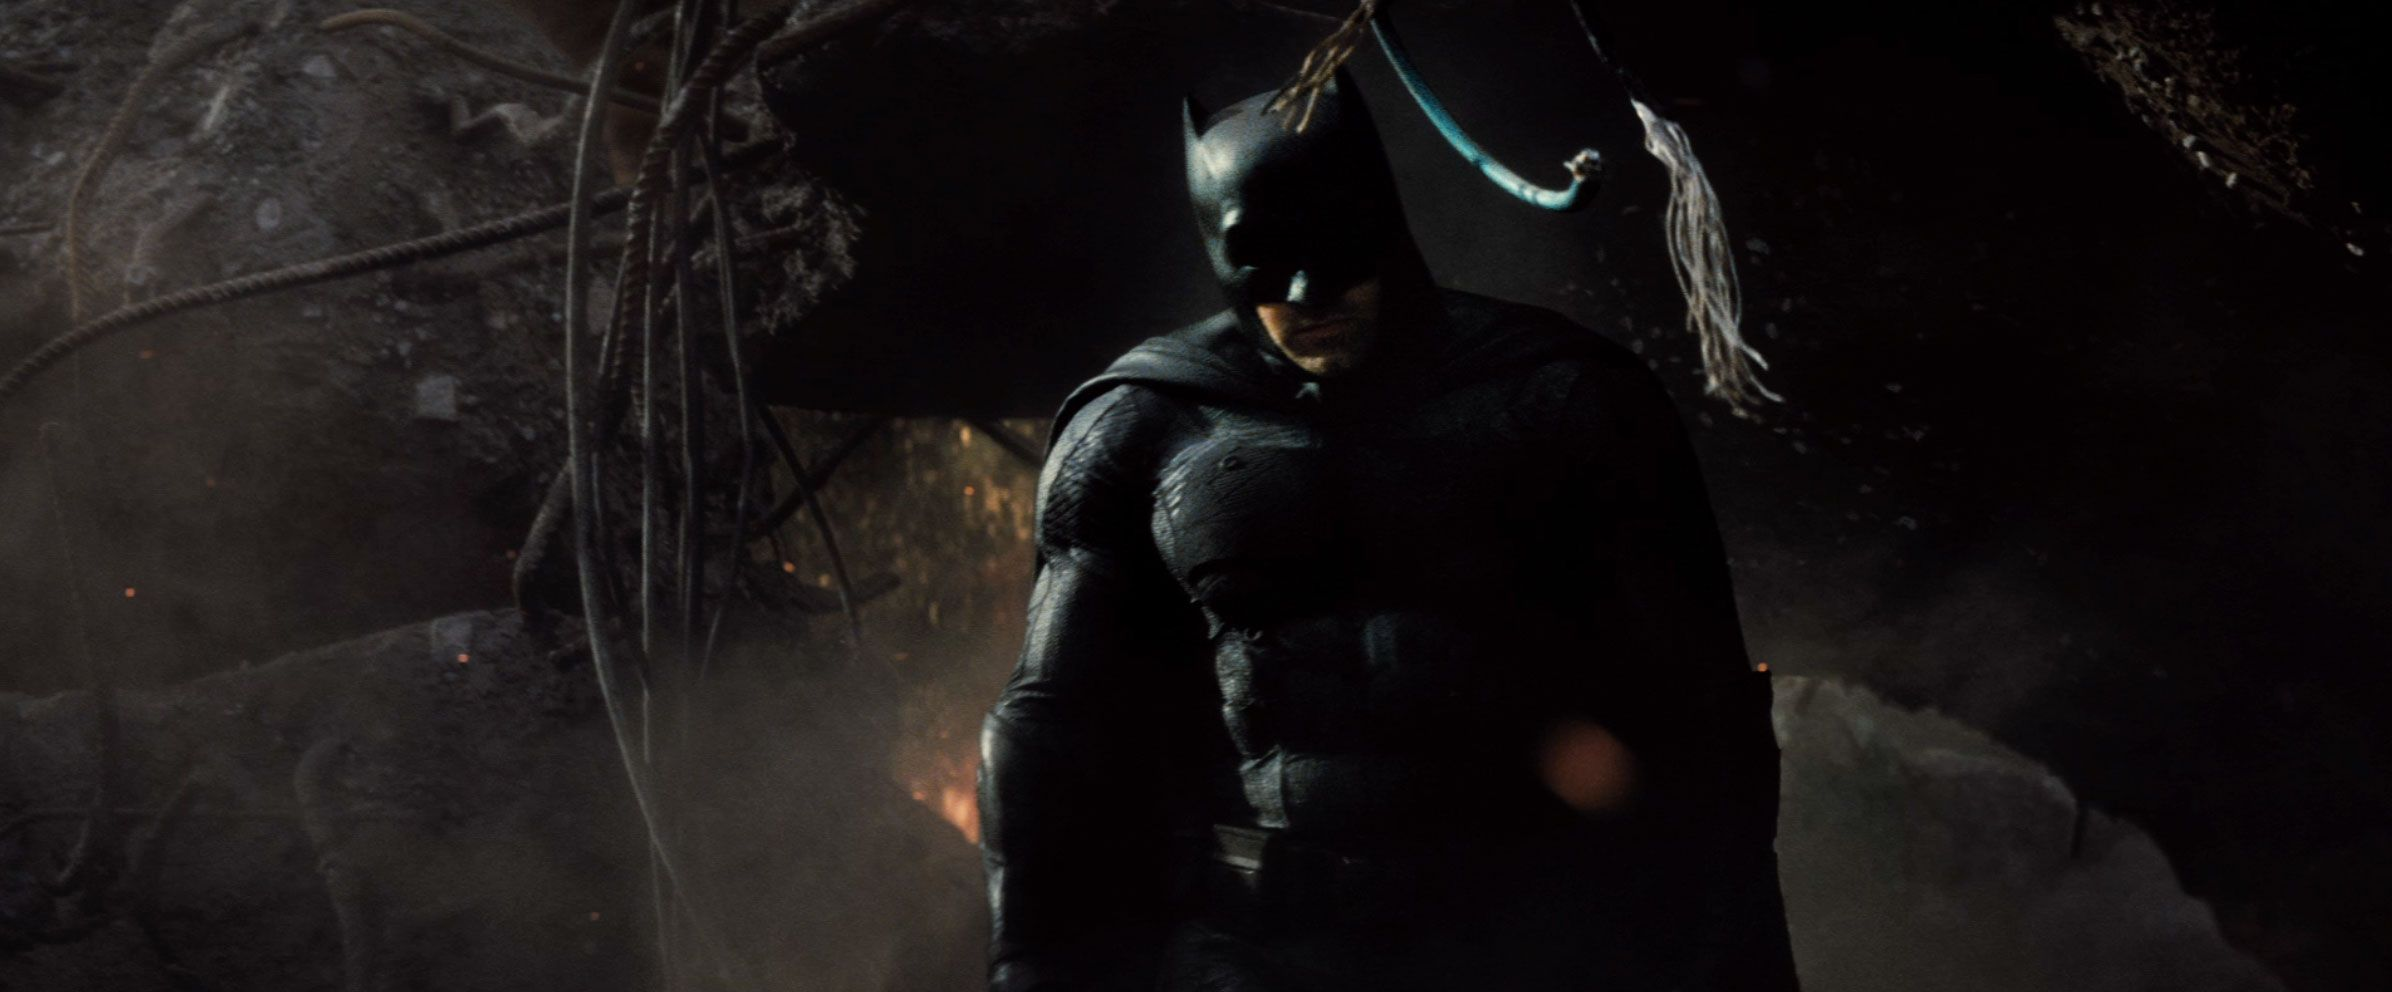 Batman V Superman Trailer Screengrab 24